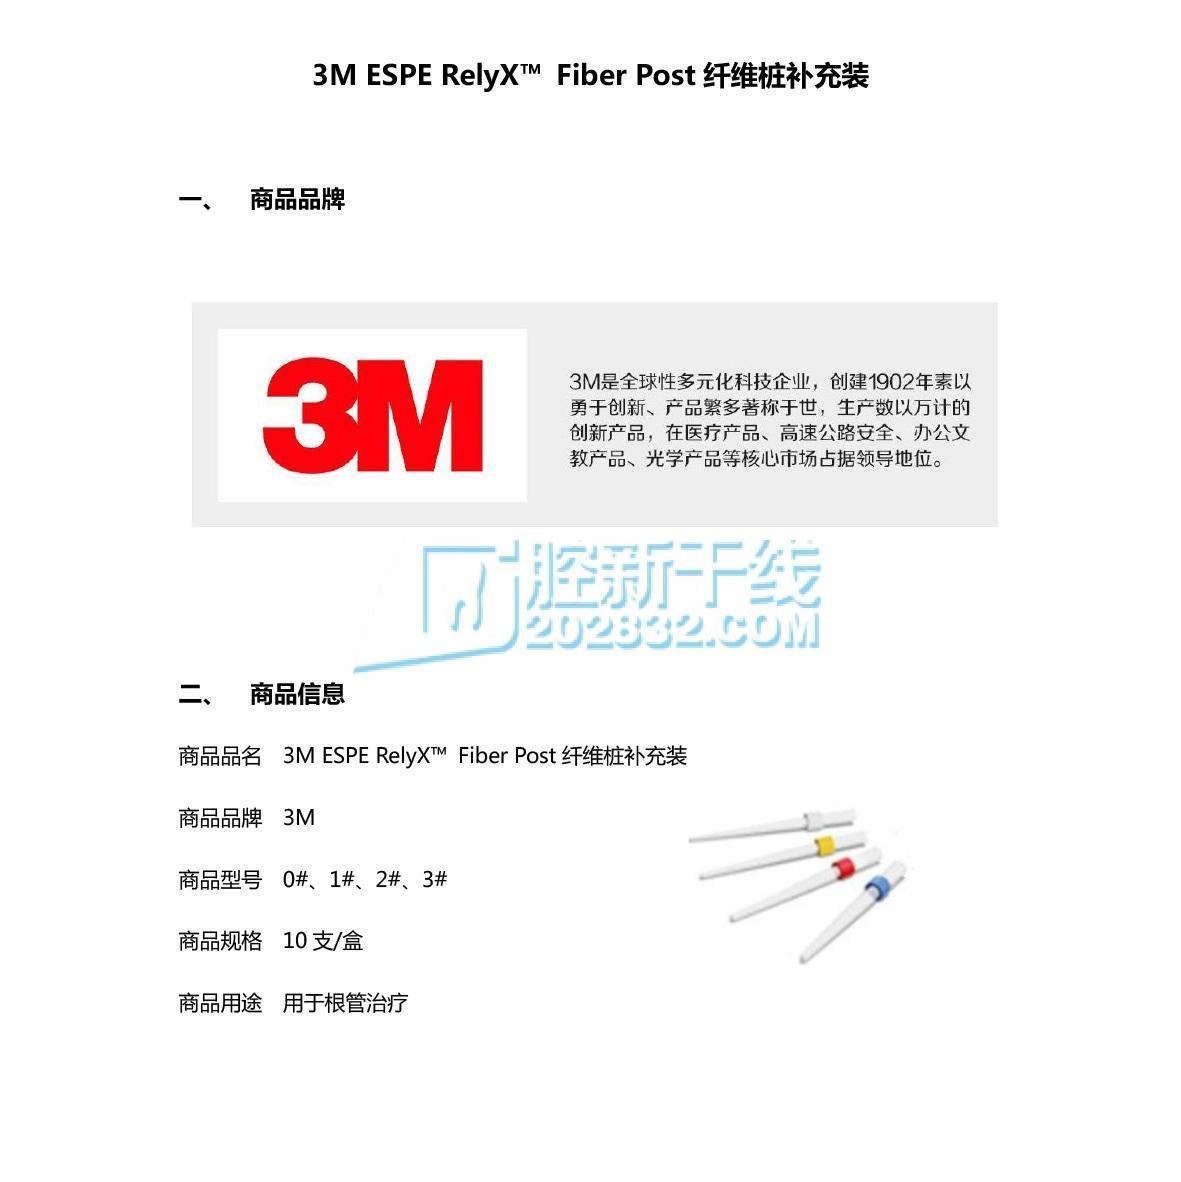 3M ESPE RelyX™ Fiber Post 纤维根管桩修复系统 纤维桩 补充装 3号 1.jpg